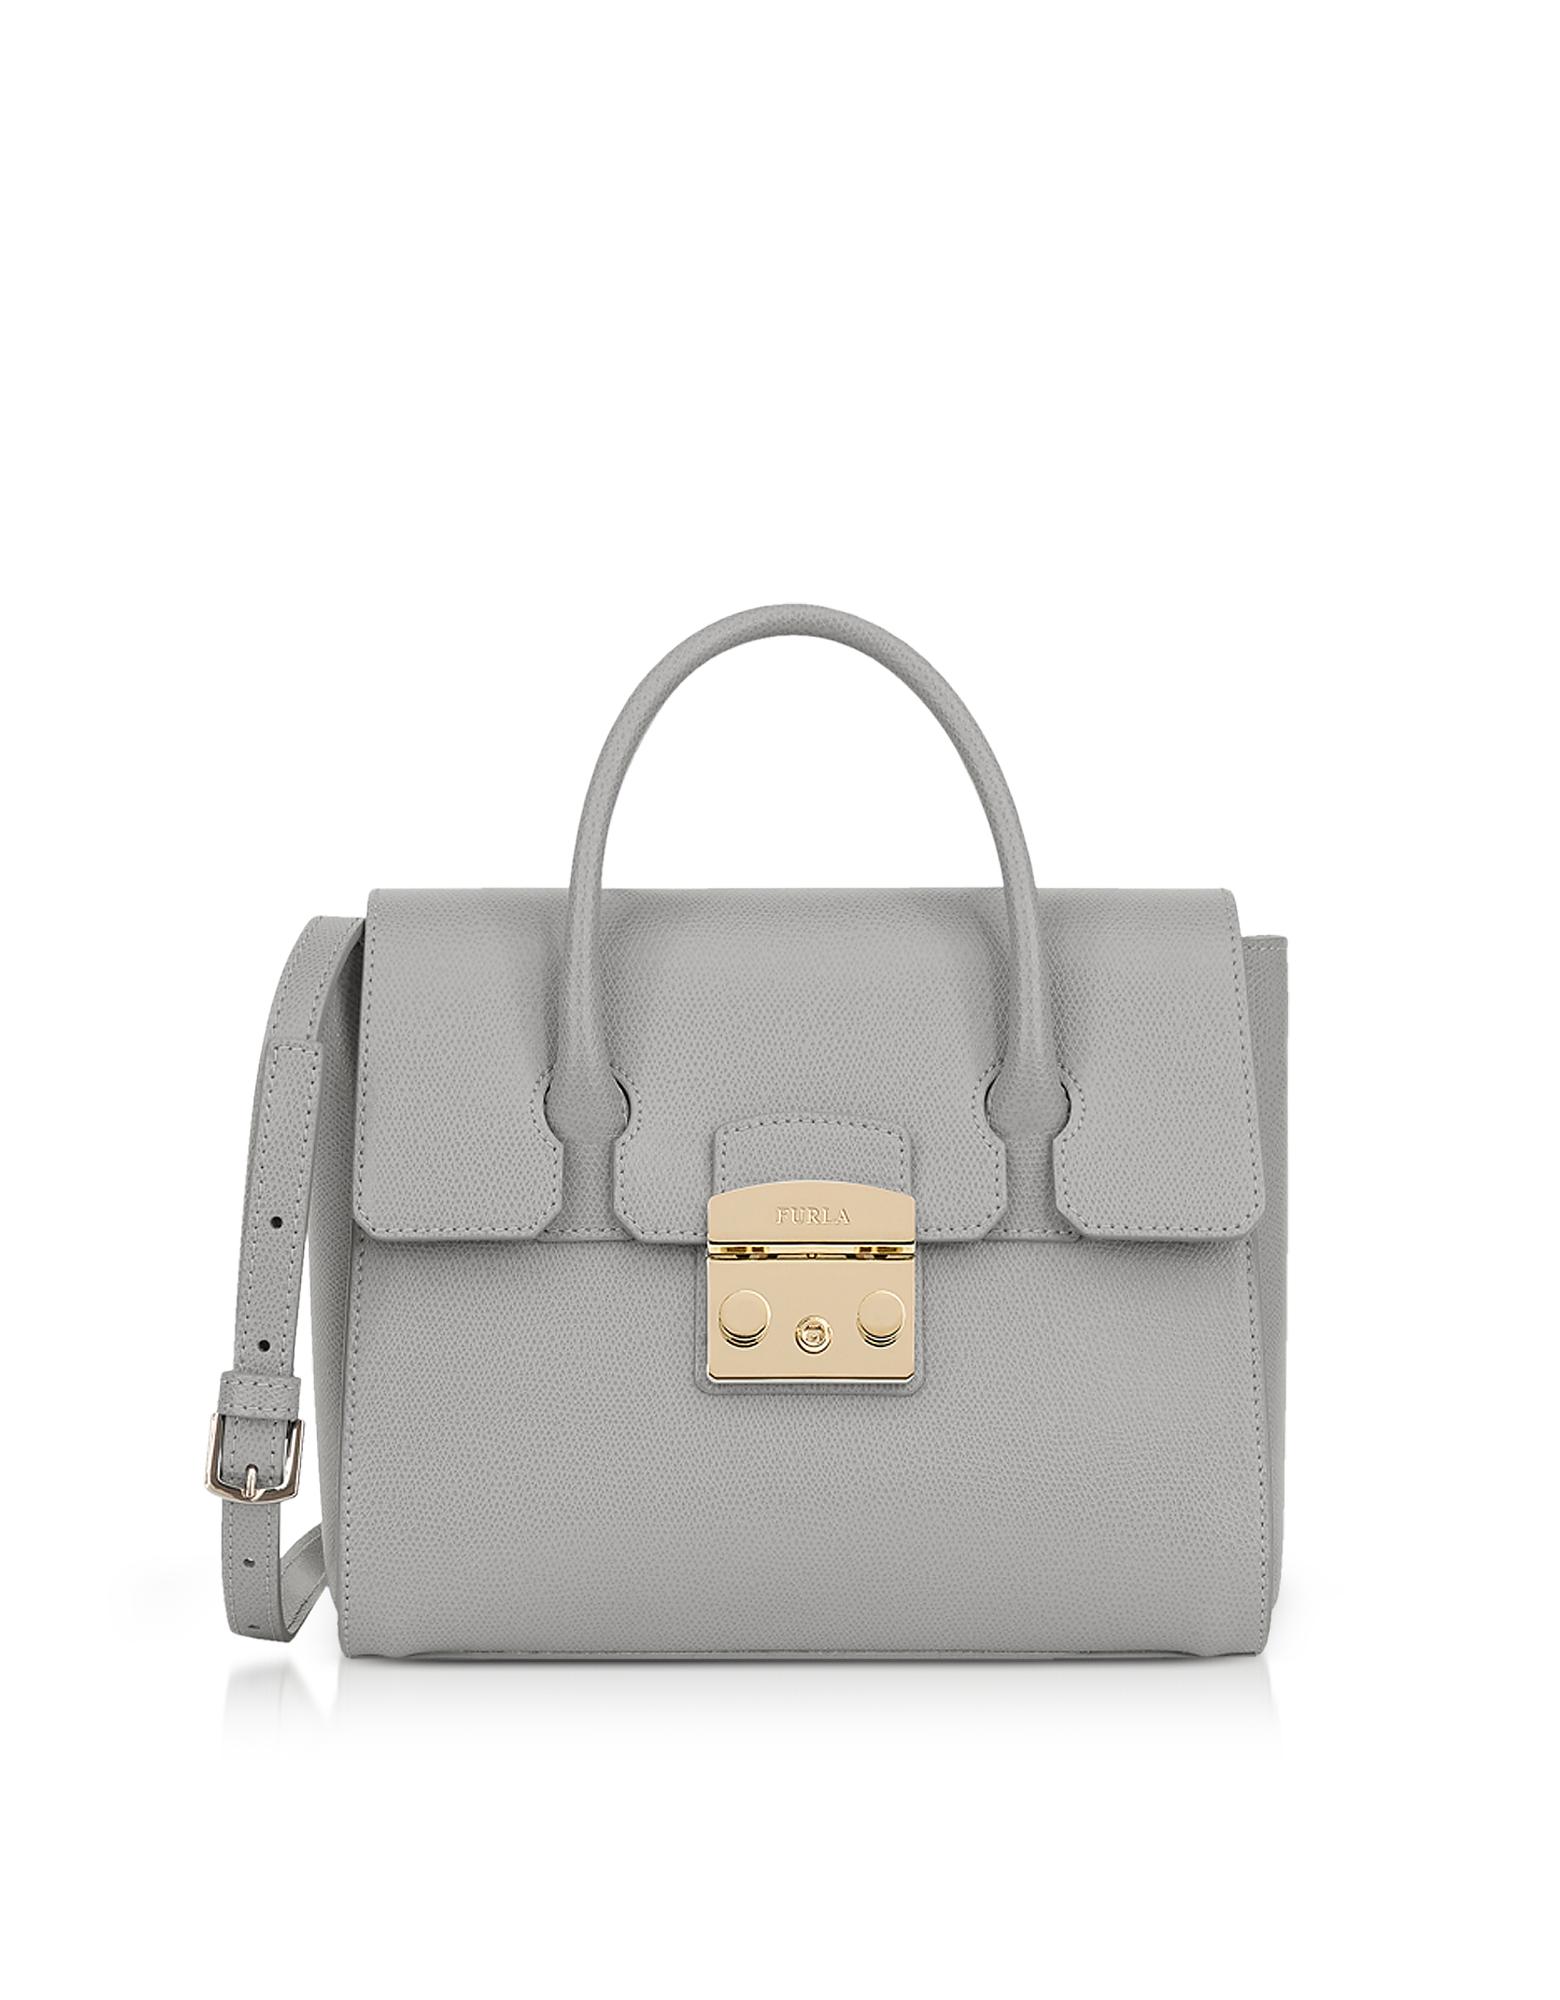 Furla Handbags, Genuine Leather Metropolis Small Satchel Bag